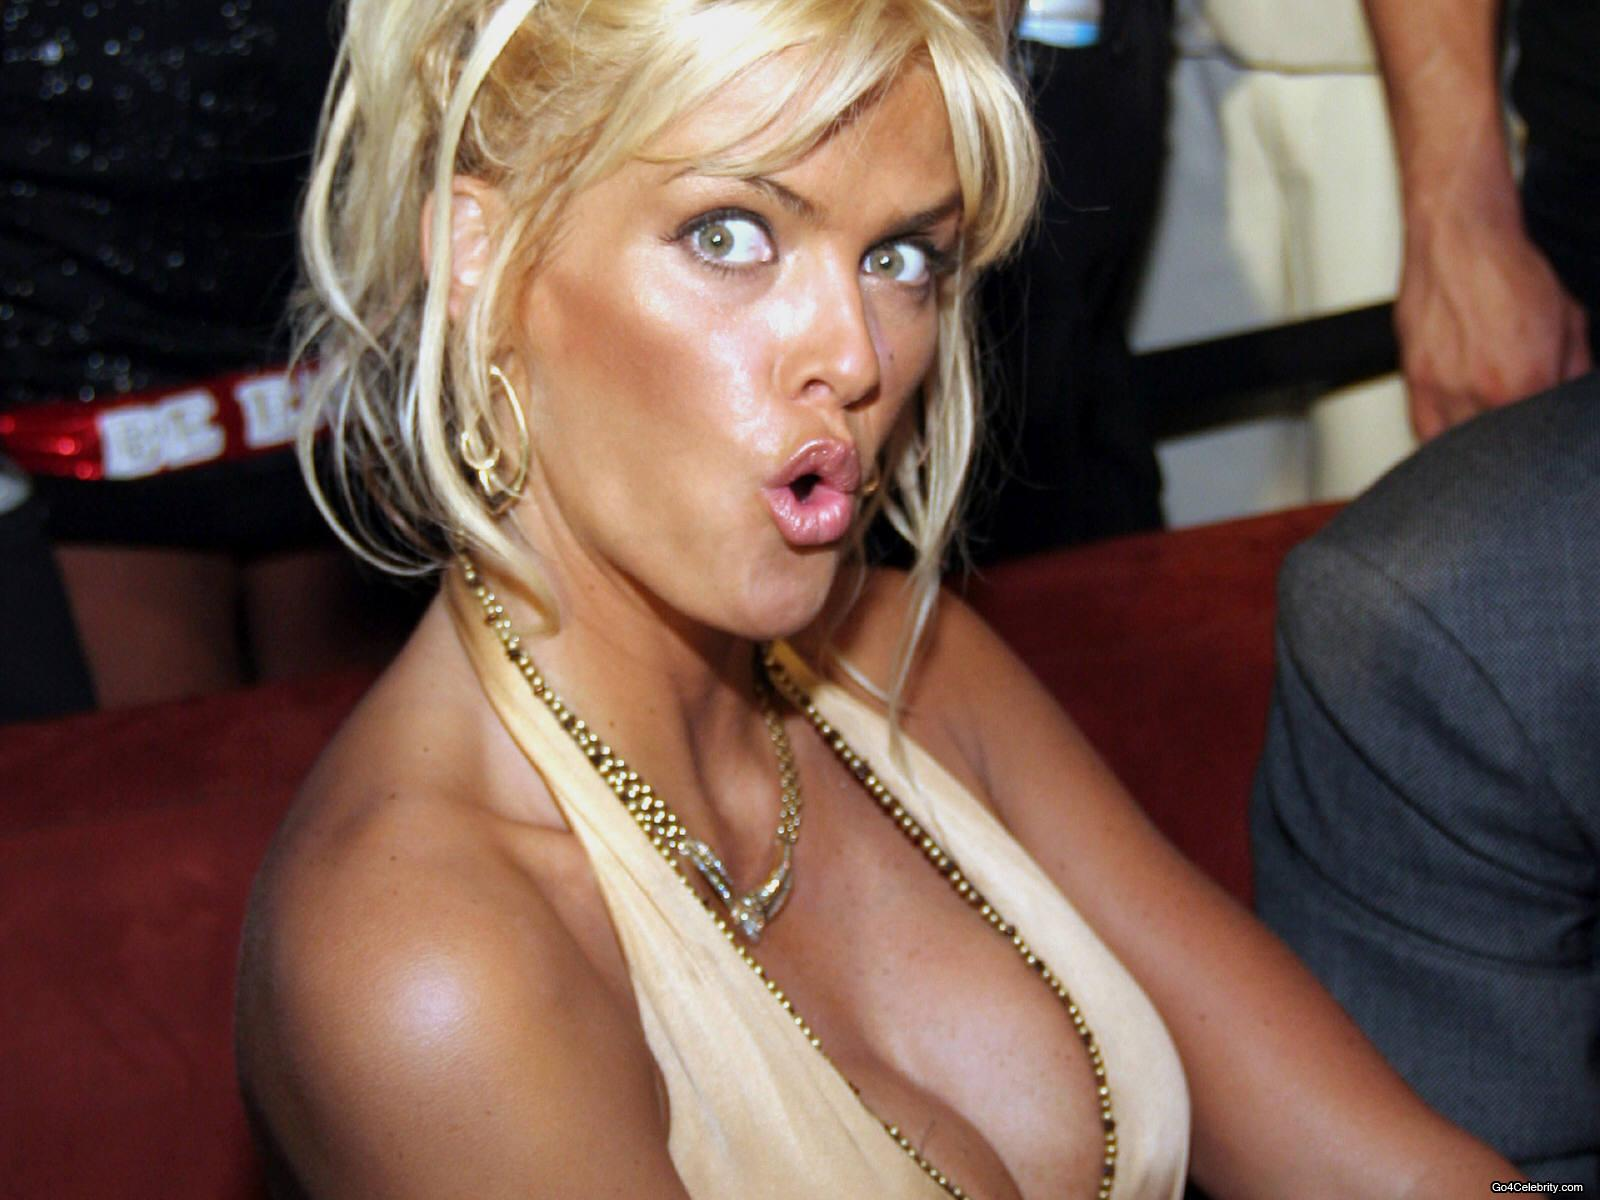 http://1.bp.blogspot.com/-ReDOObsLtyw/TbvCgGtMxEI/AAAAAAAAAnQ/s-6ZkBhOk8o/s1600/Anna-Nicole-Smith-001.jpg